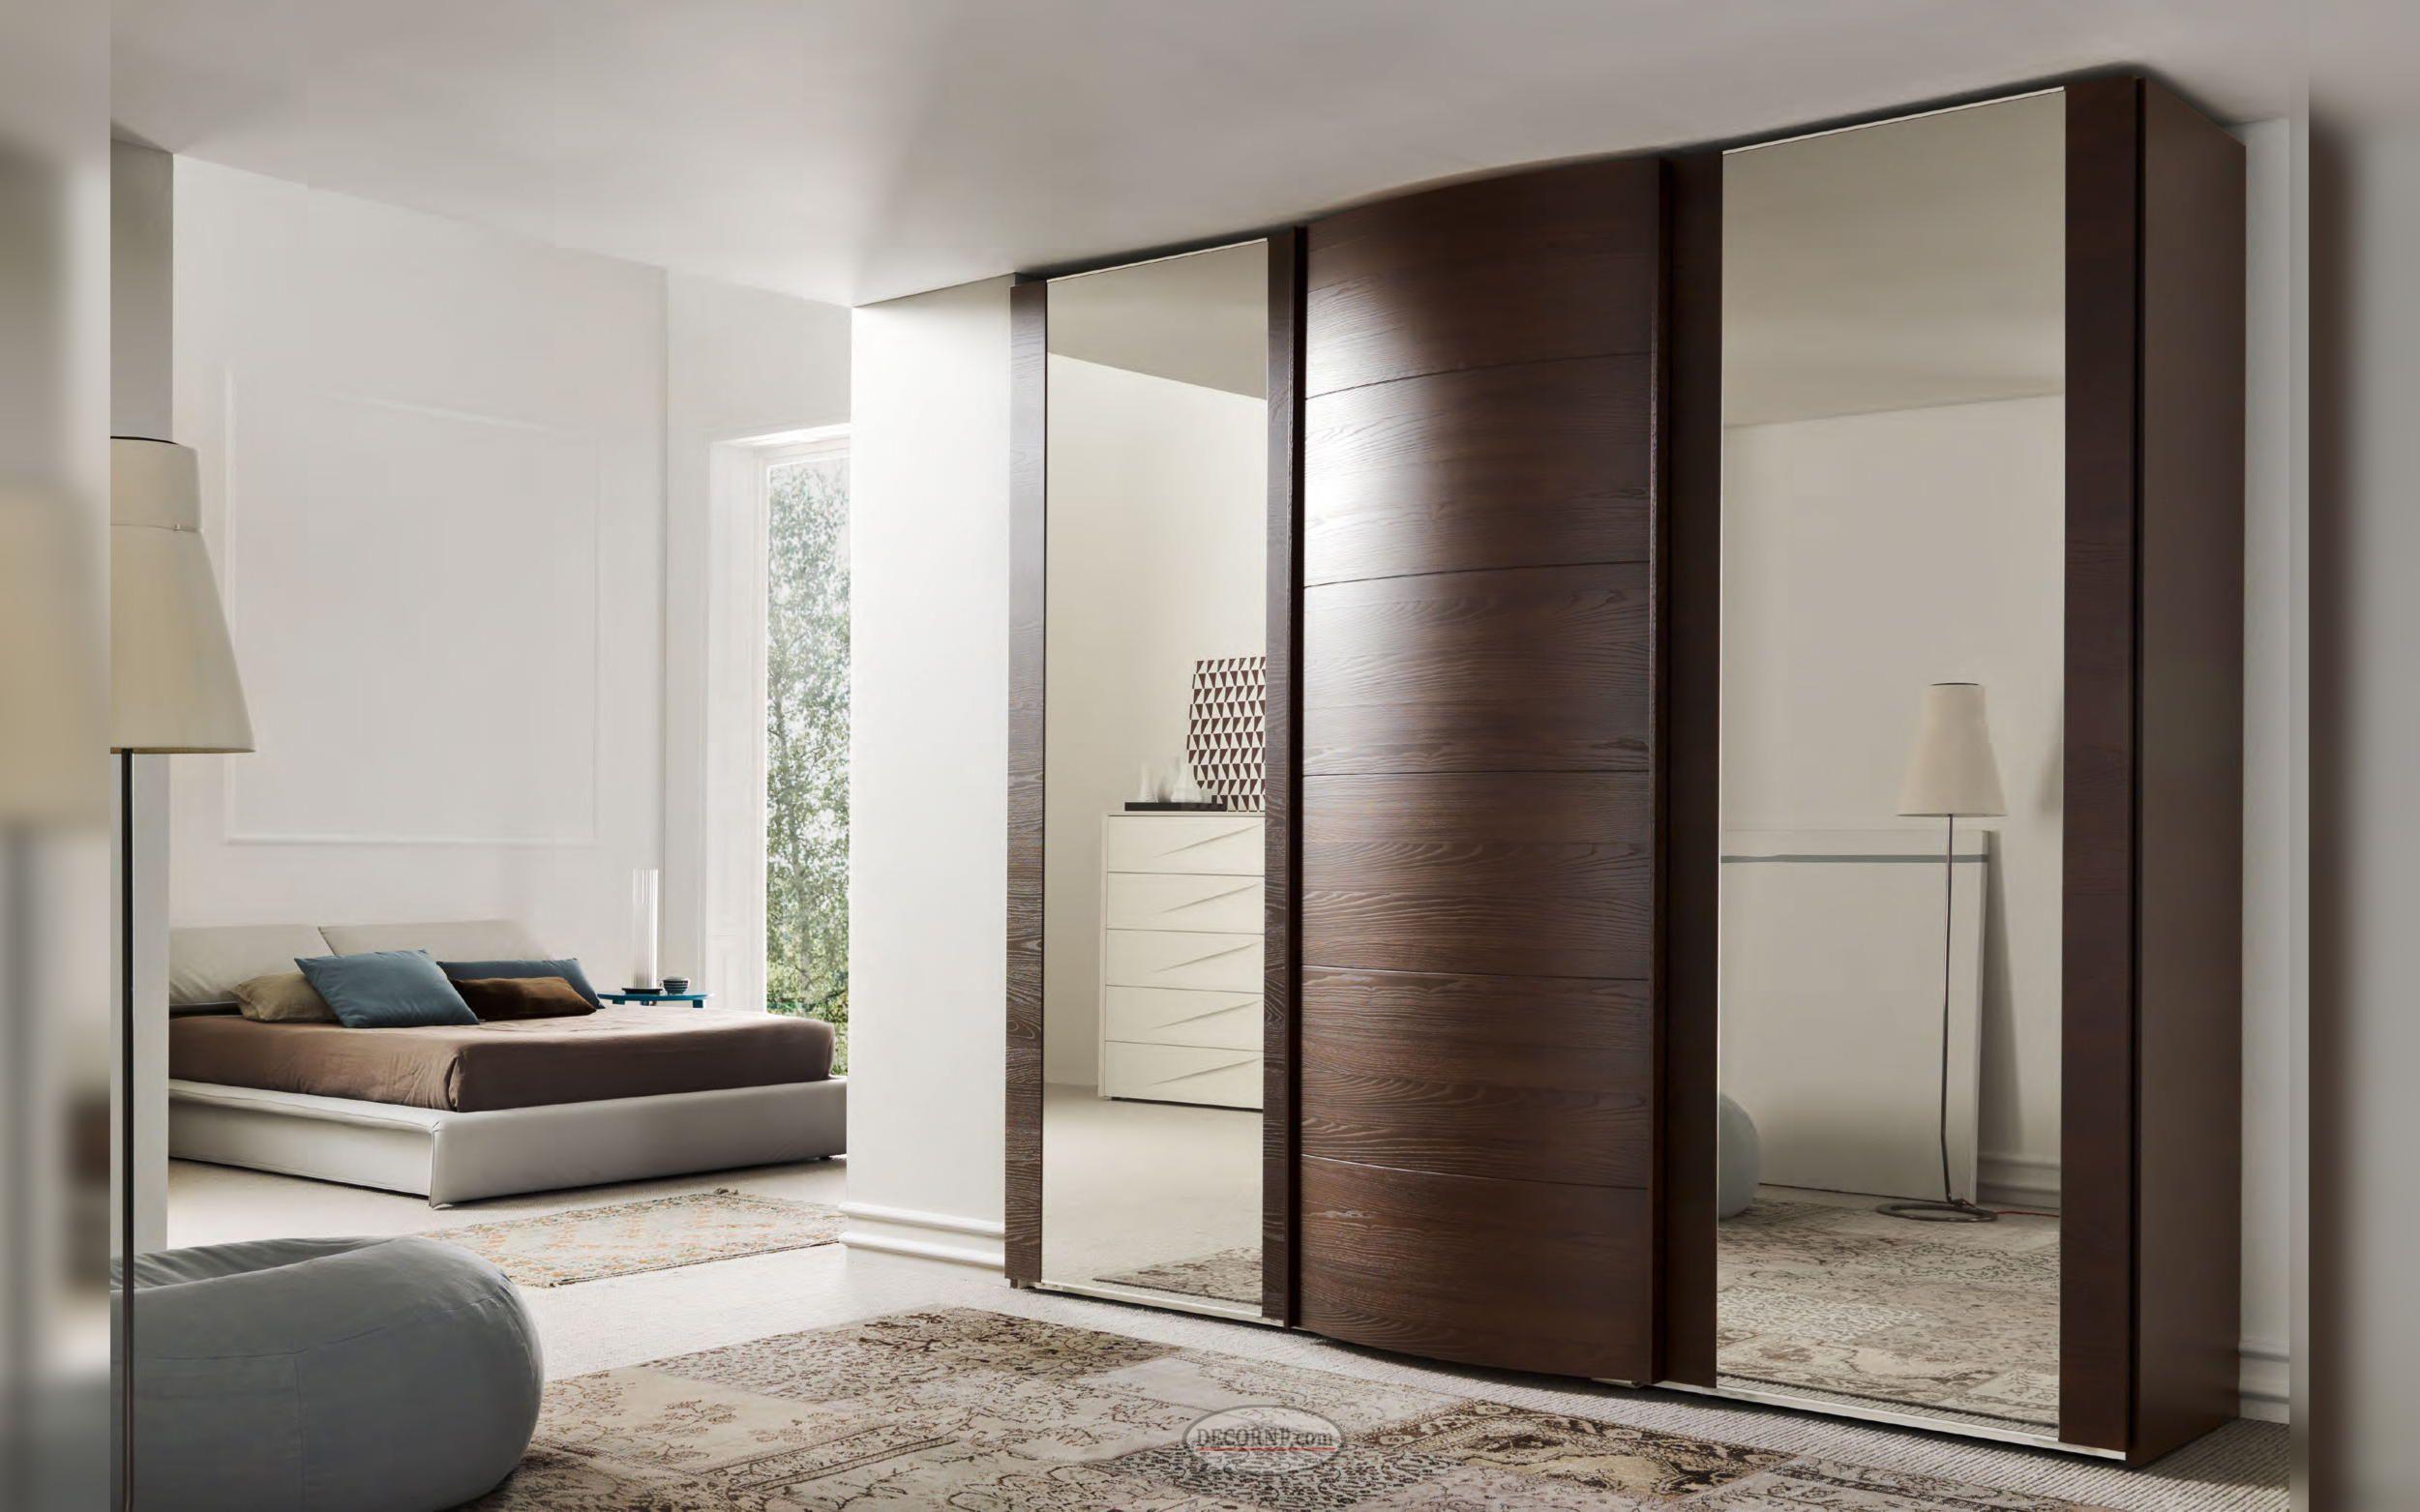 Sliding Mirror Wardrobe Doors Wardrobe Design 2019 Wardrobe